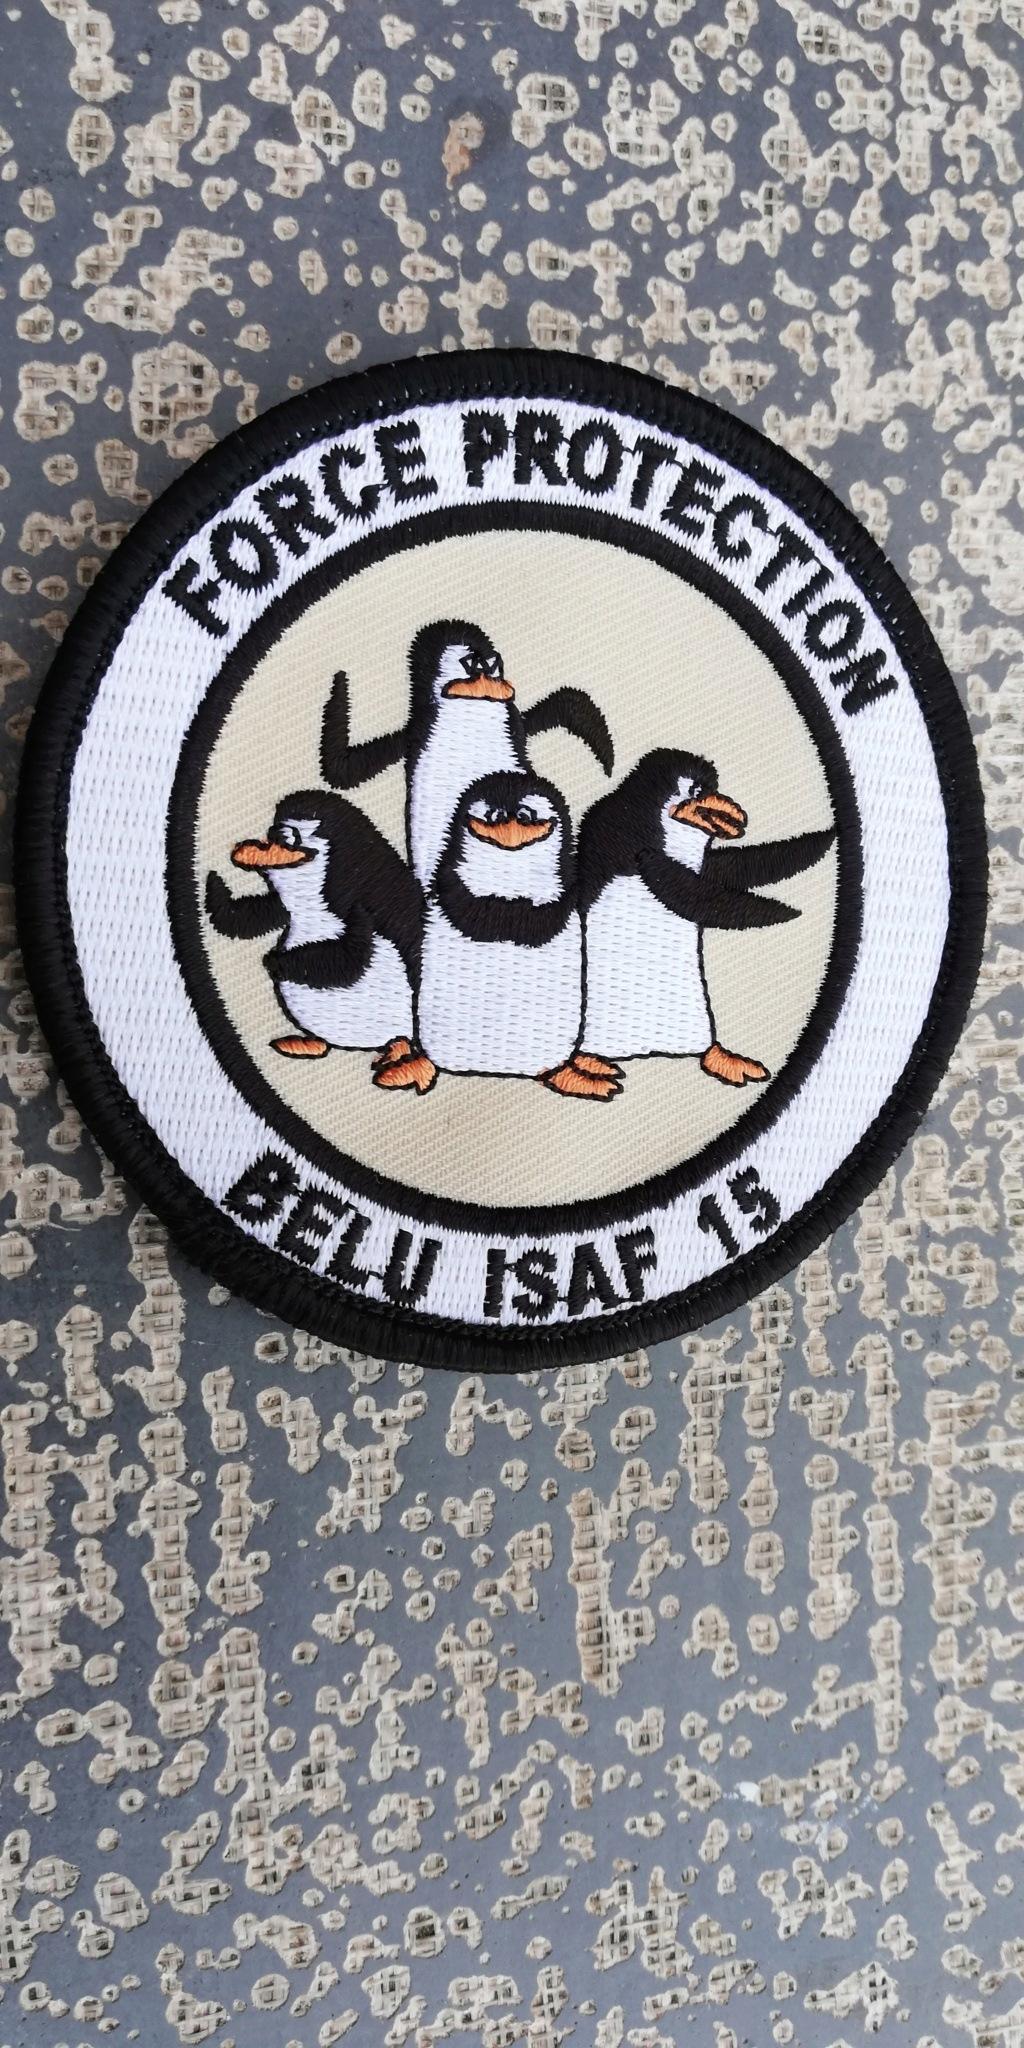 INSIGNES BELGES * MISSION EXTERIEURE OTAN ISAF ONU KFOR ISFOR SFOR ... Img_2302